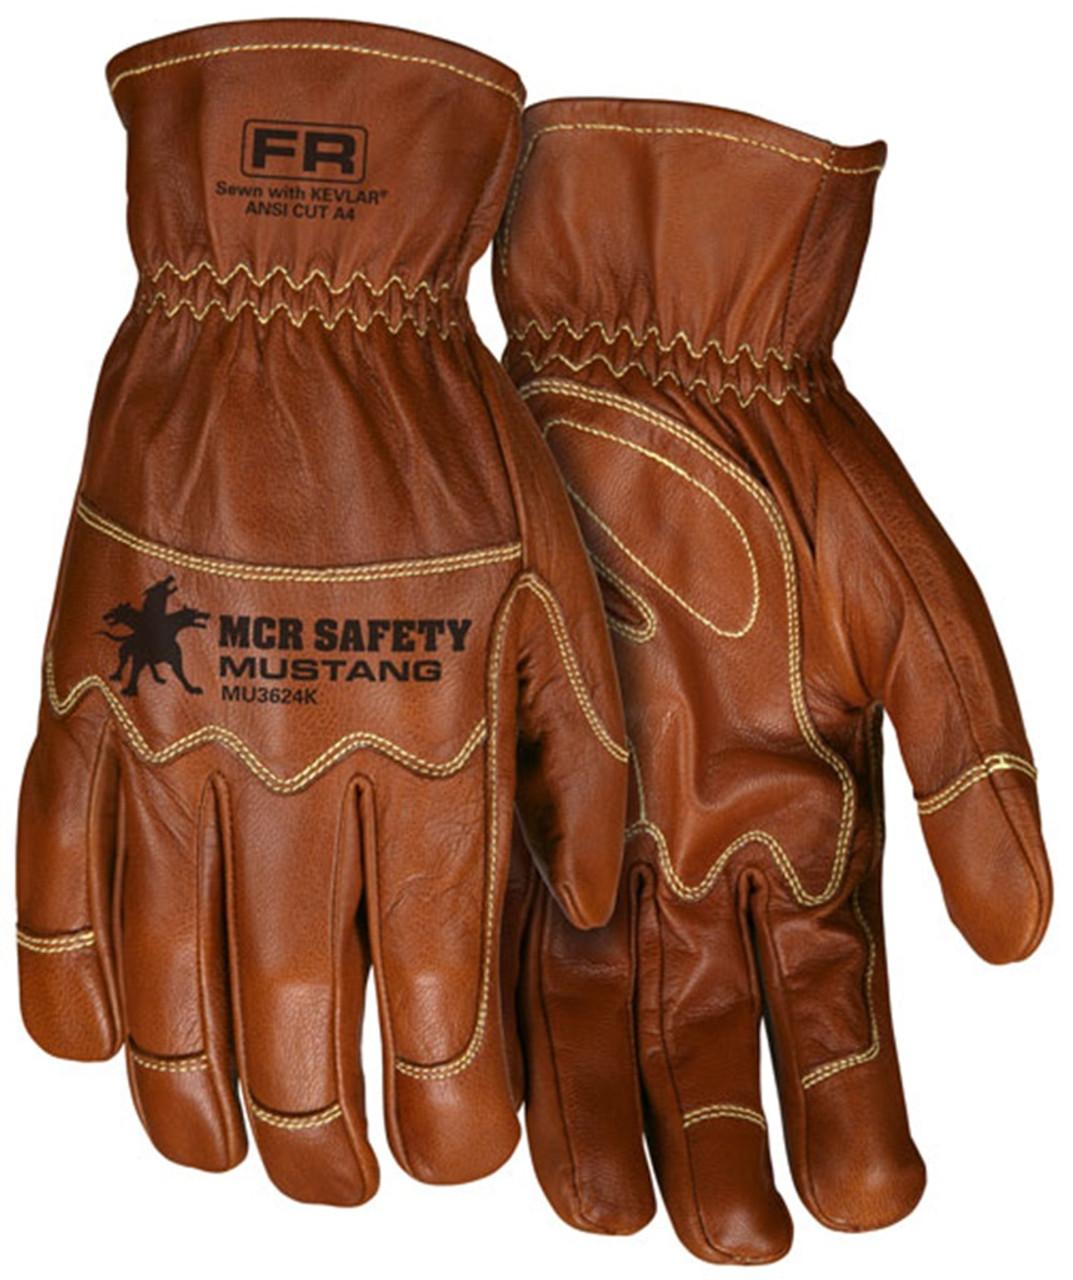 MCR Safety MU3624KM Mustang Utility Goatskin Leather Gloves, Size Medium (1 Pair)